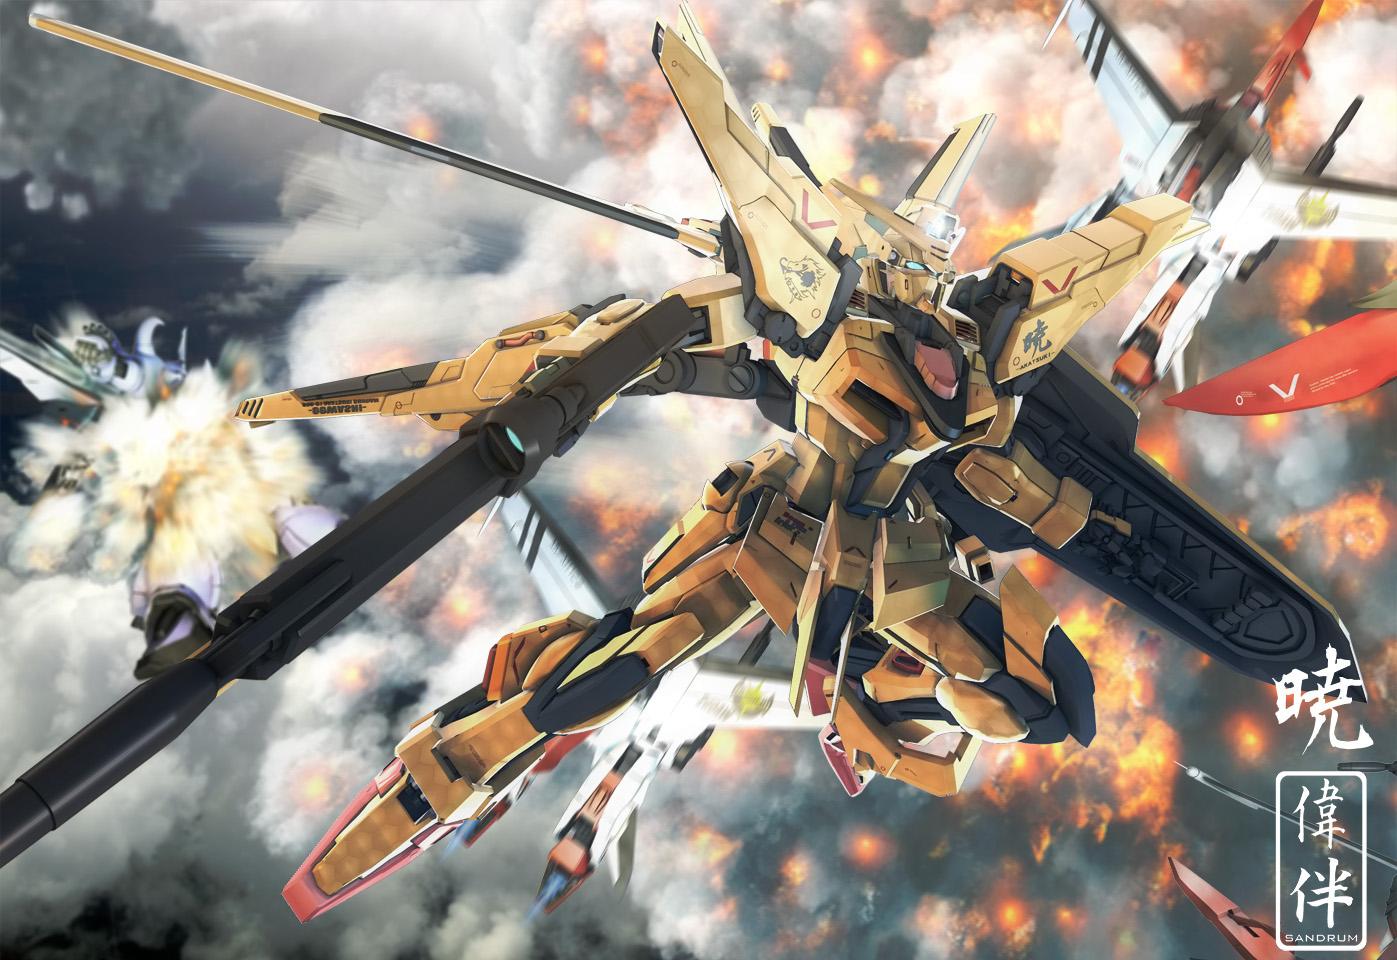 Another 10 Gundam Inspired Wallpapers by deviantArt 1397x960